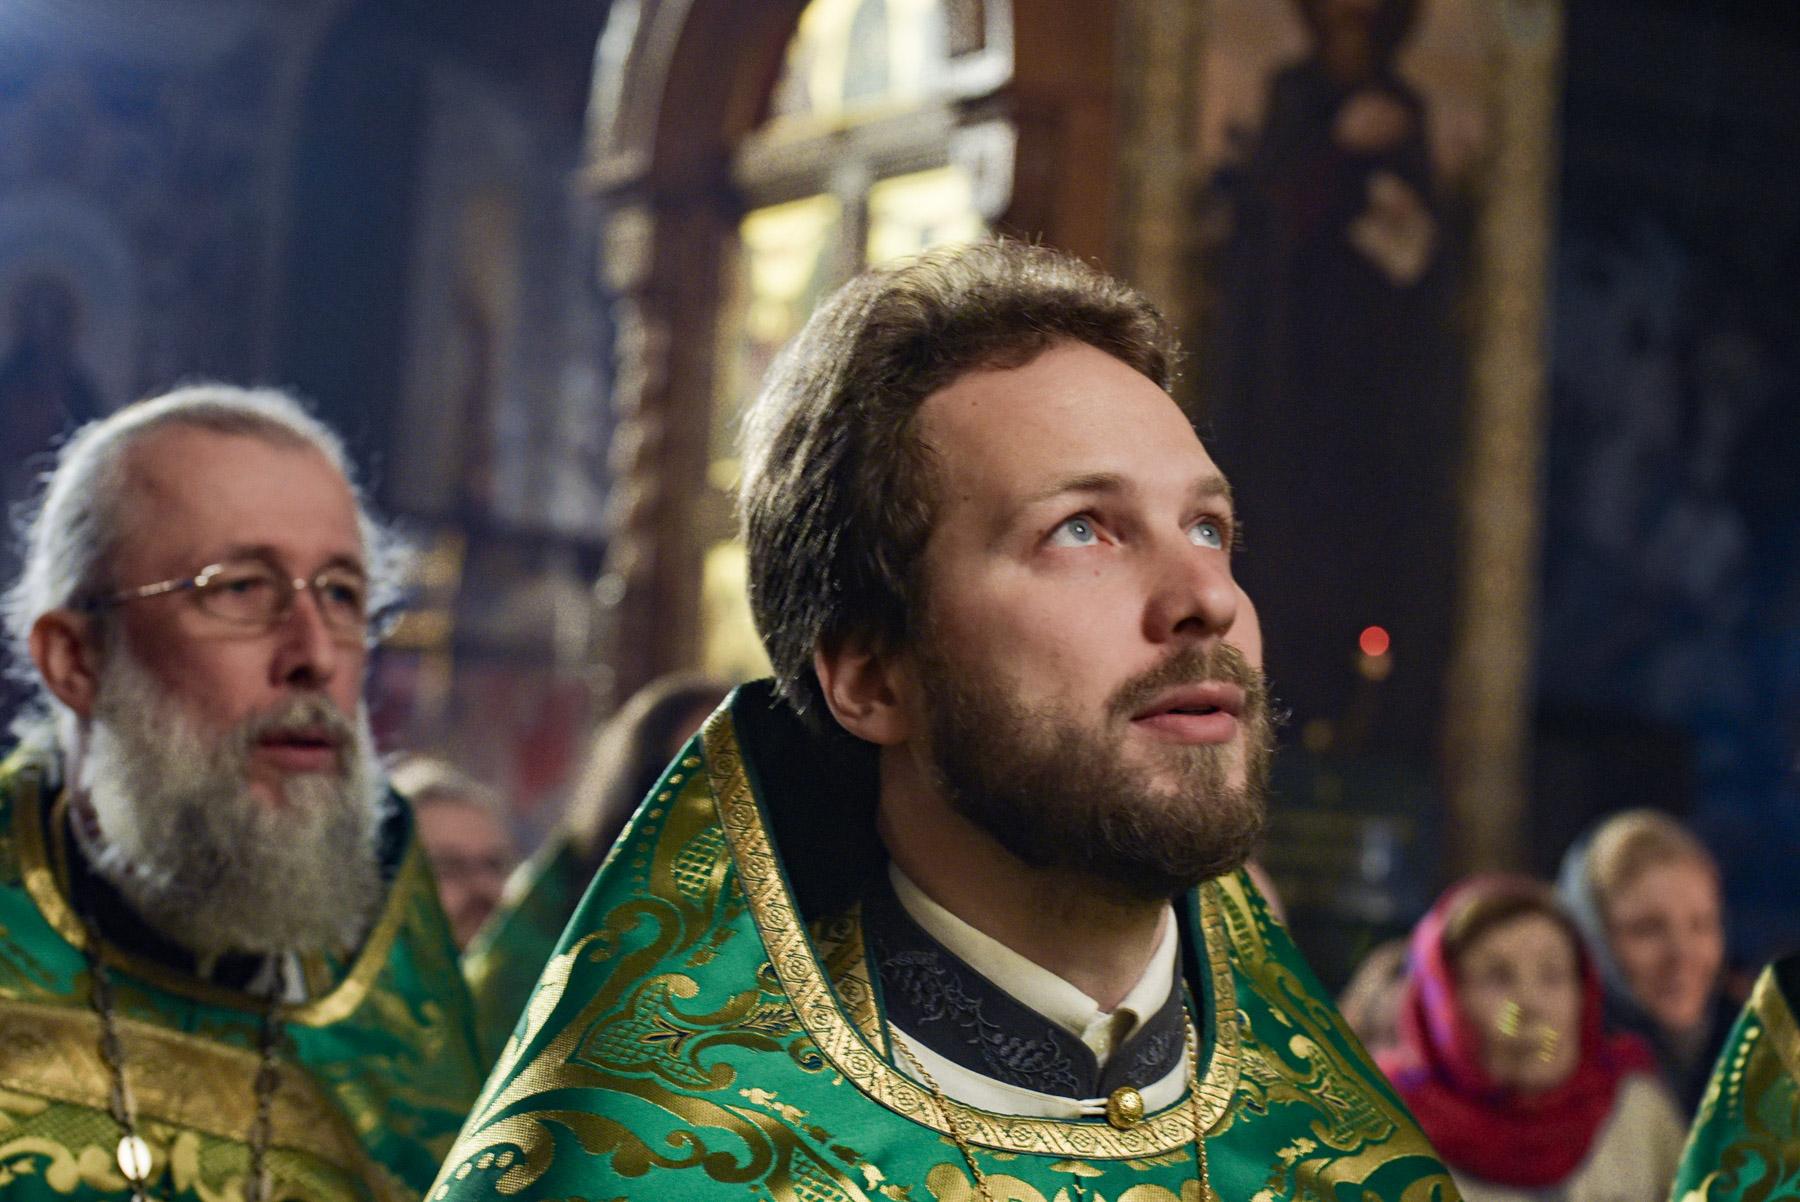 photos of orthodox christmas 0093 2